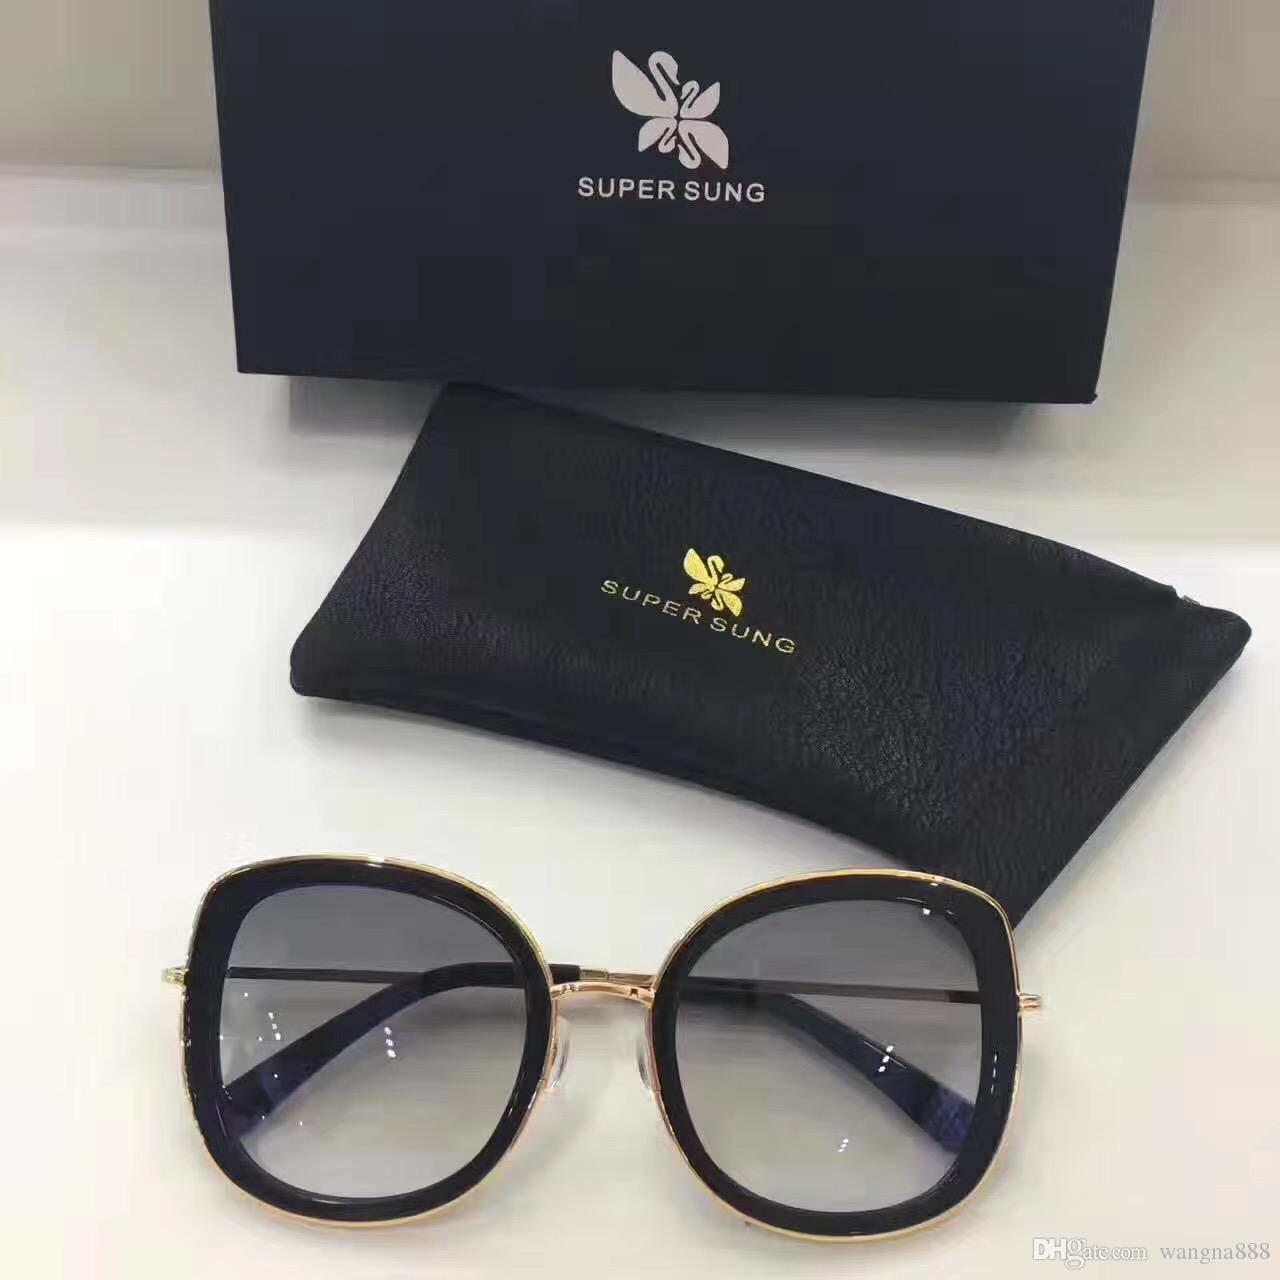 d49972dee3b Luxury Sunglasses Popular Italy SUPER SUNG Fashion Sunglasses Top Quality  Special Sunglasses Women Design UV Protection Come Case 001 Sunglasses At  Night ...